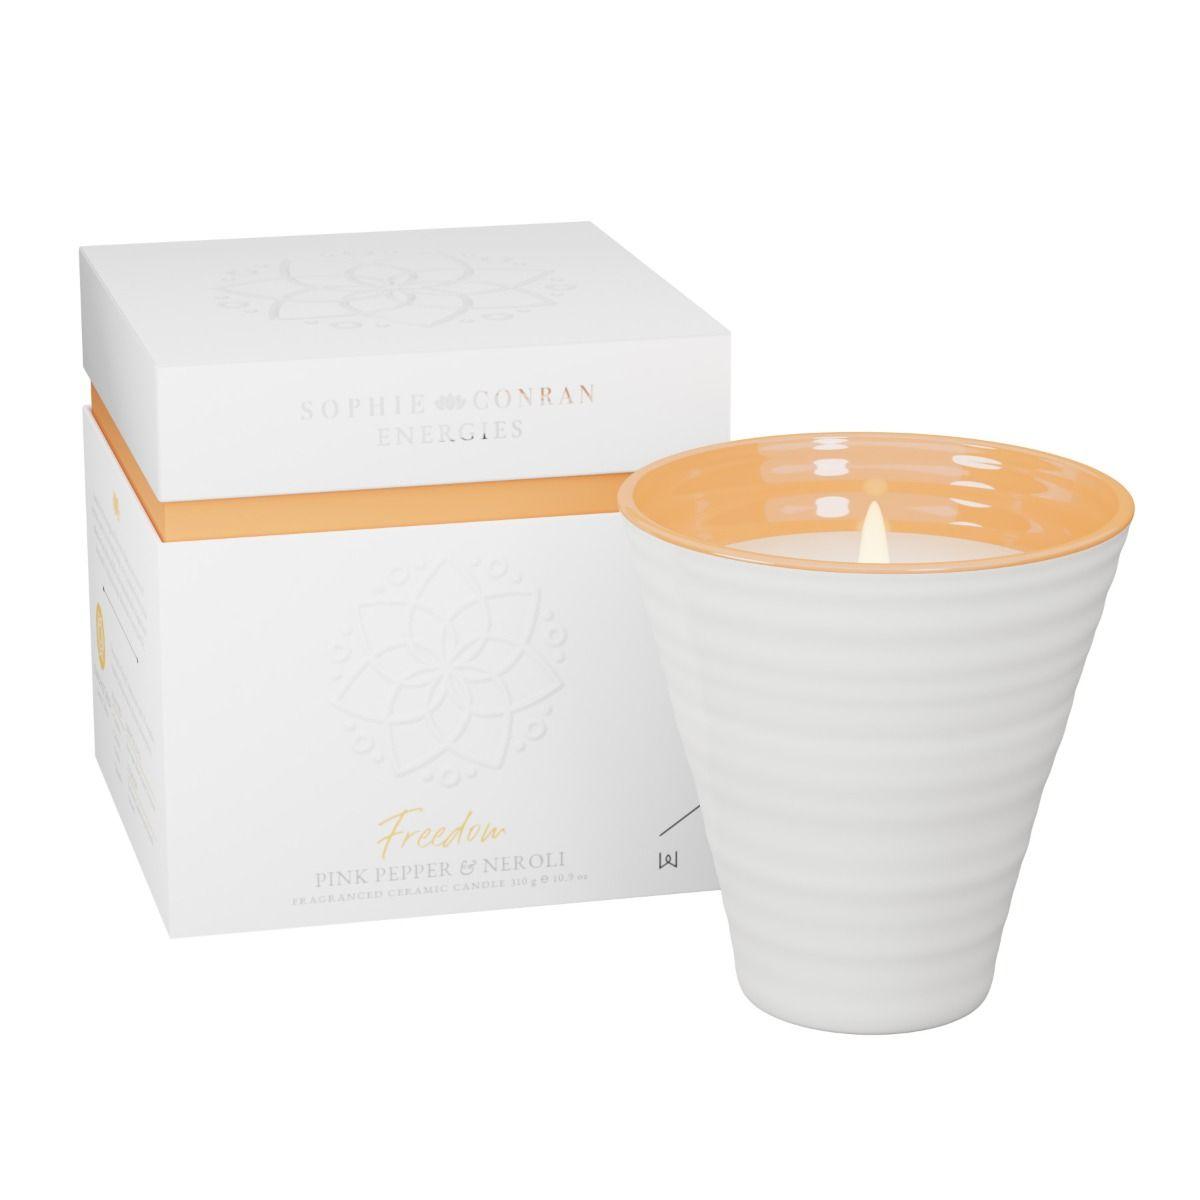 Sophie Conran Energies | Pink Pepper & Neroli Ceramic Candle